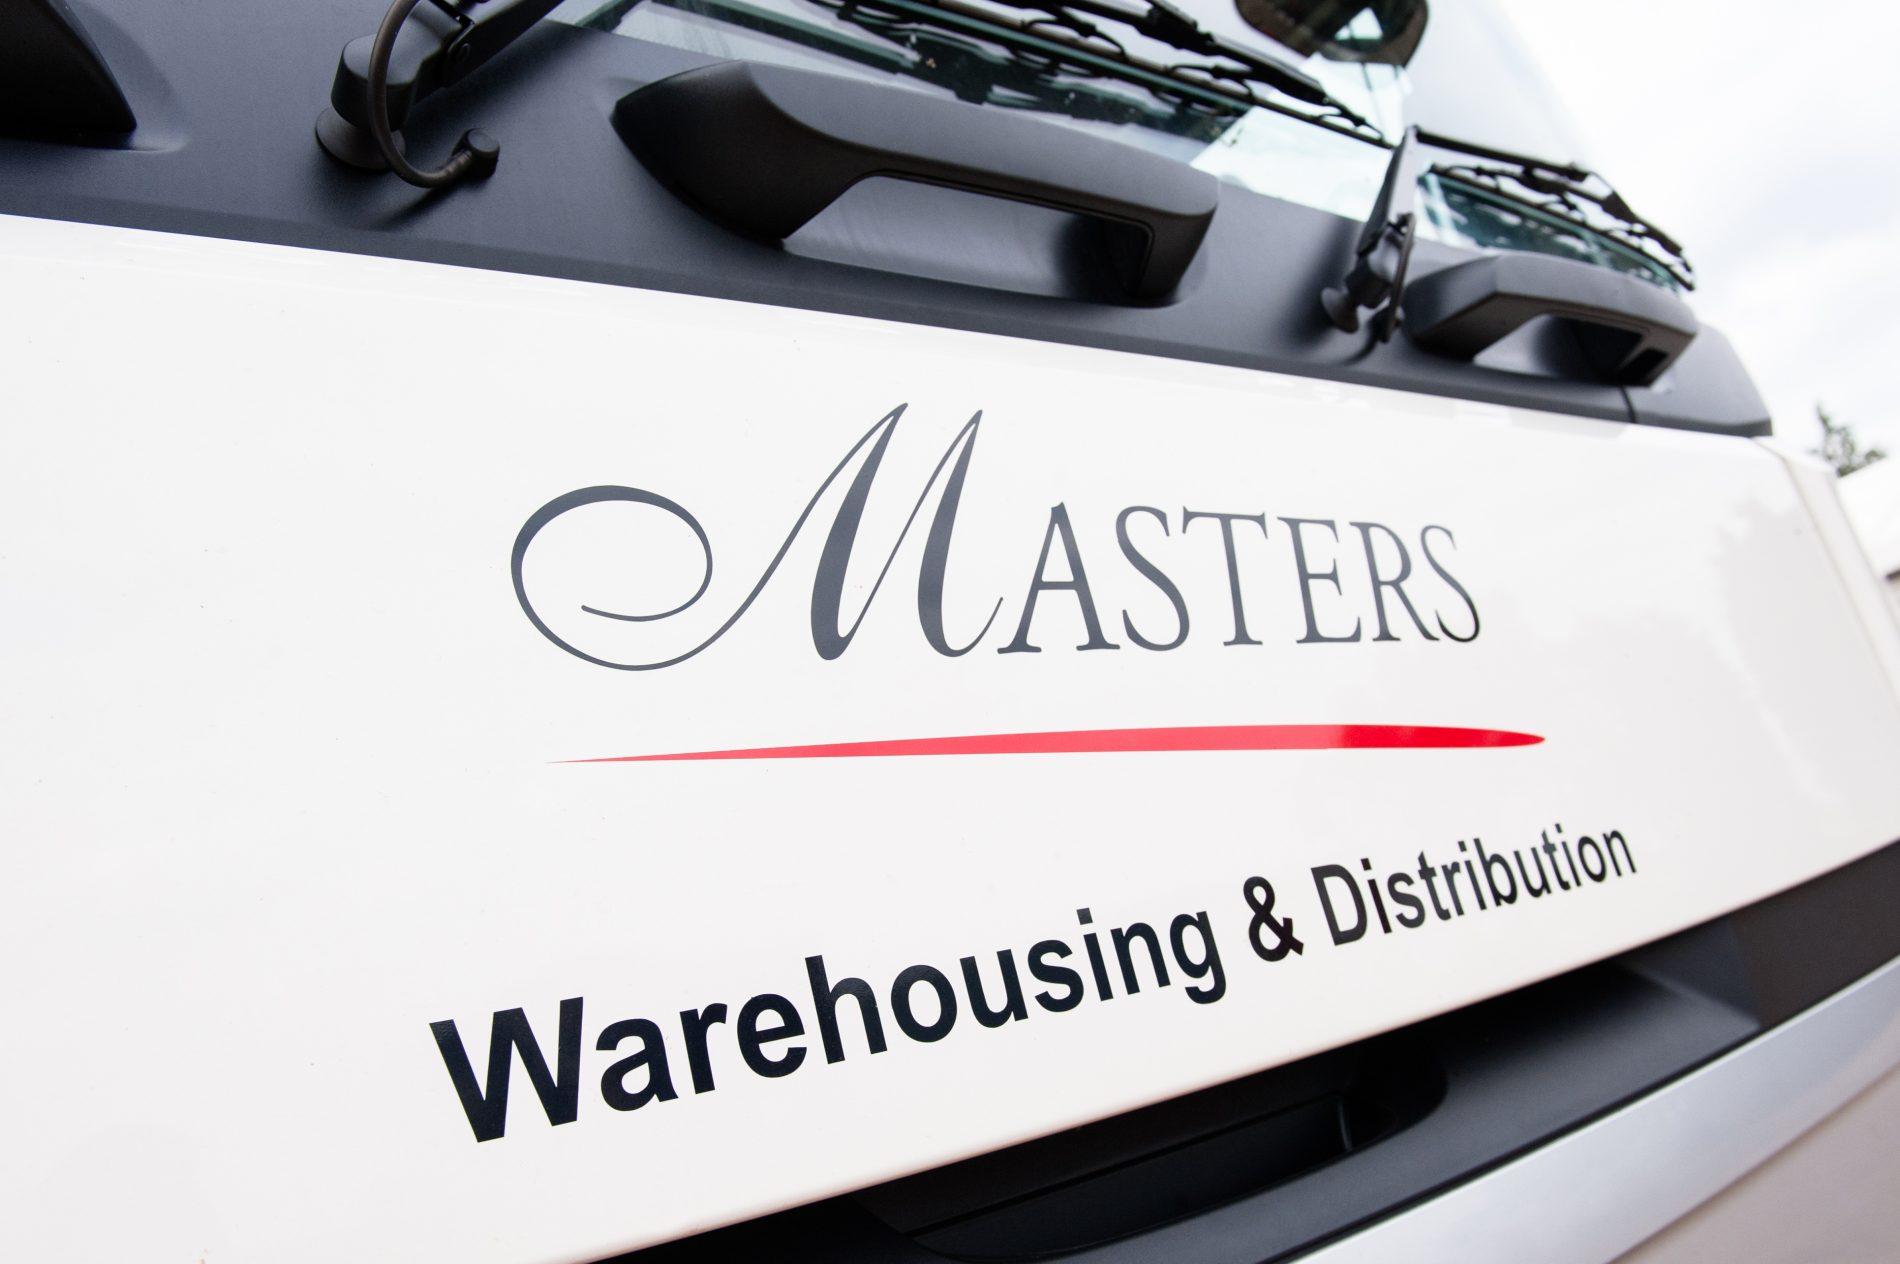 Masters - The fleet